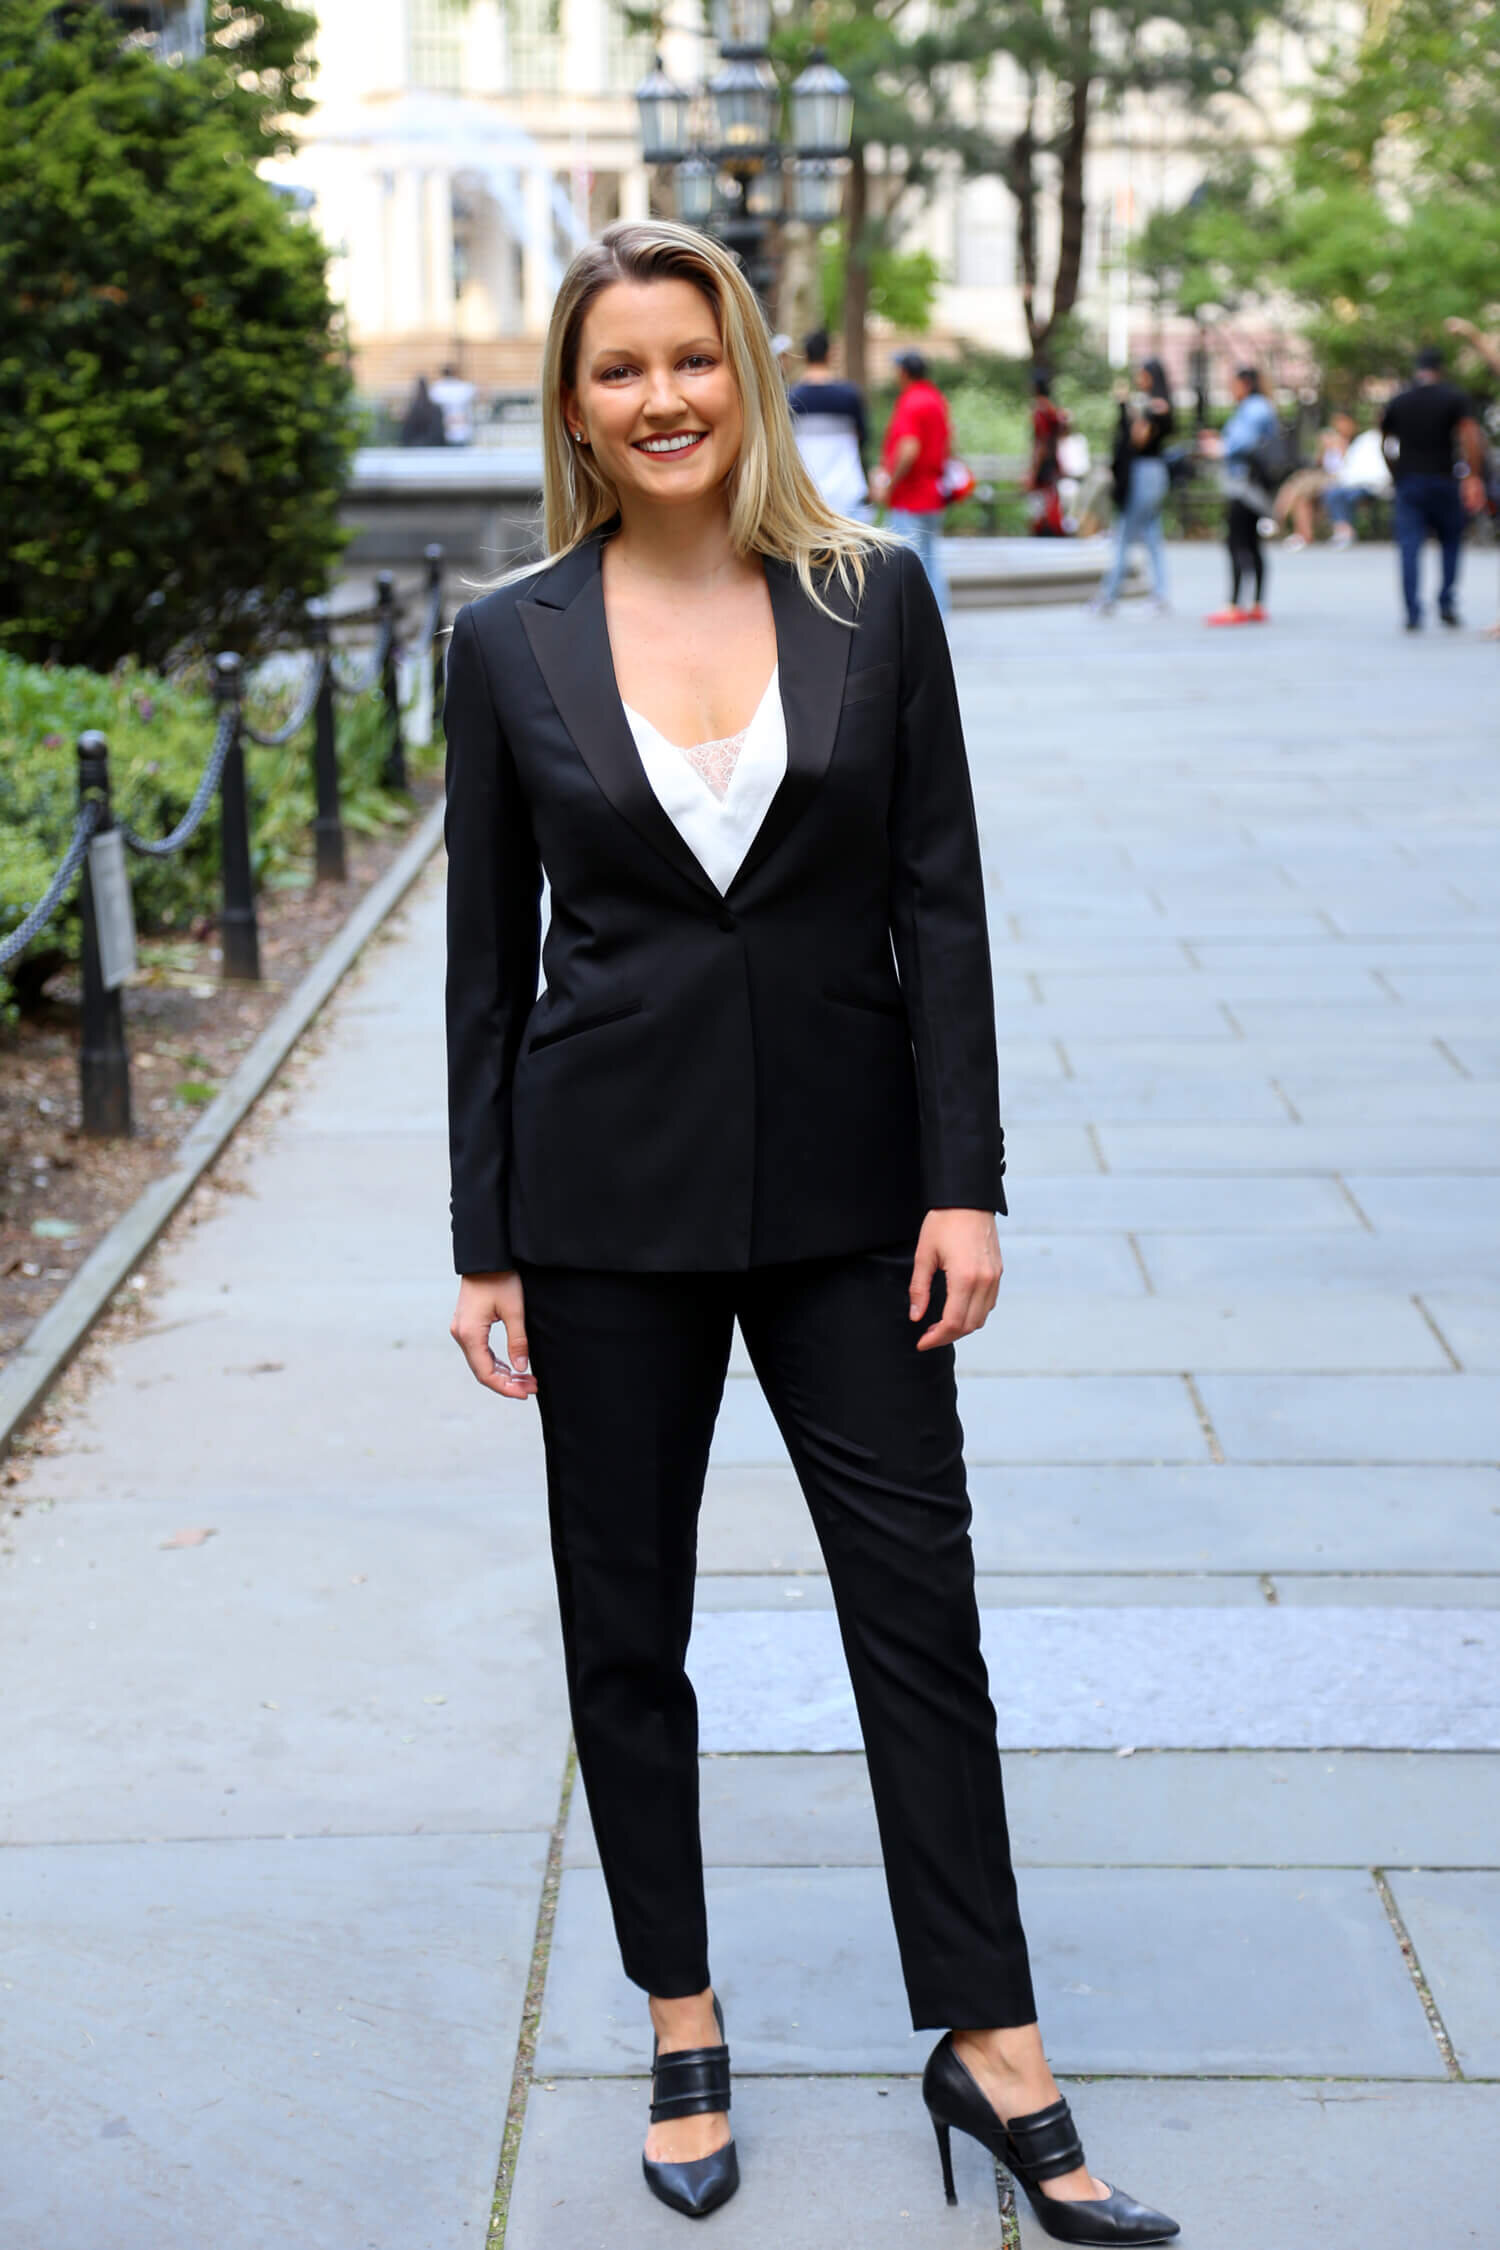 Christina in a groomswoman tuxedo.